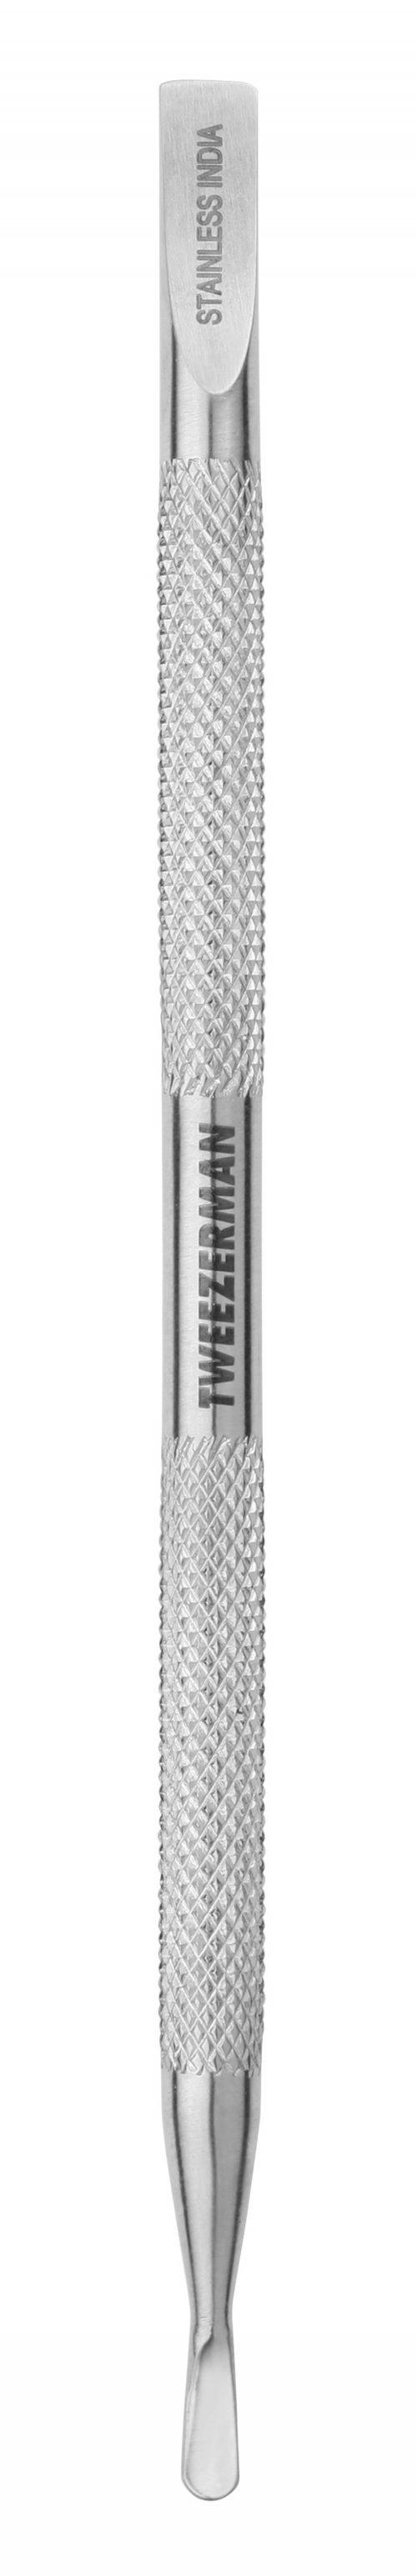 Tweezerman Pushy Cuticle Nail Cleaner